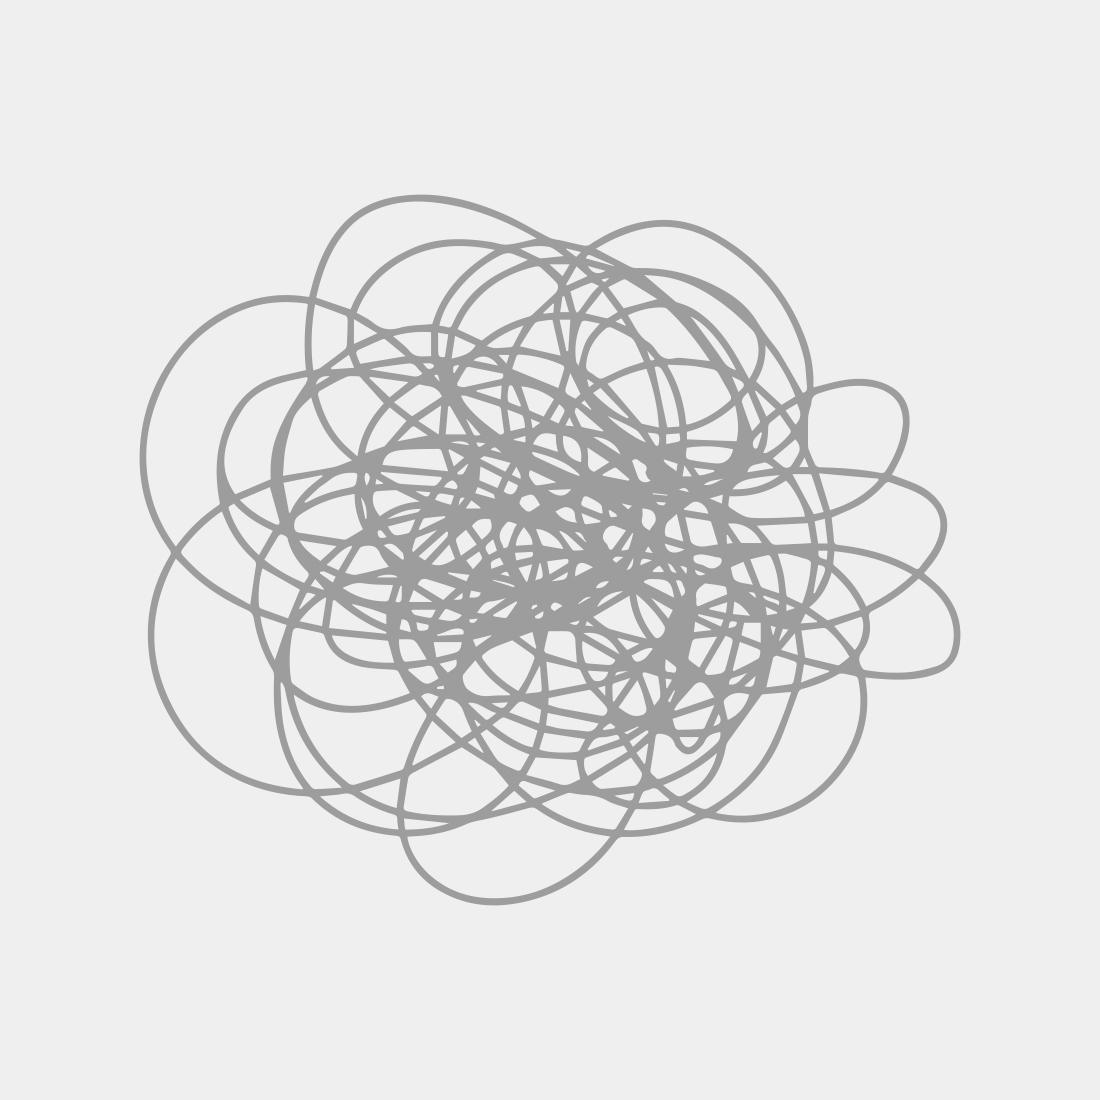 Albert Irvin OBE RA Untitled opus w.24 (framed)